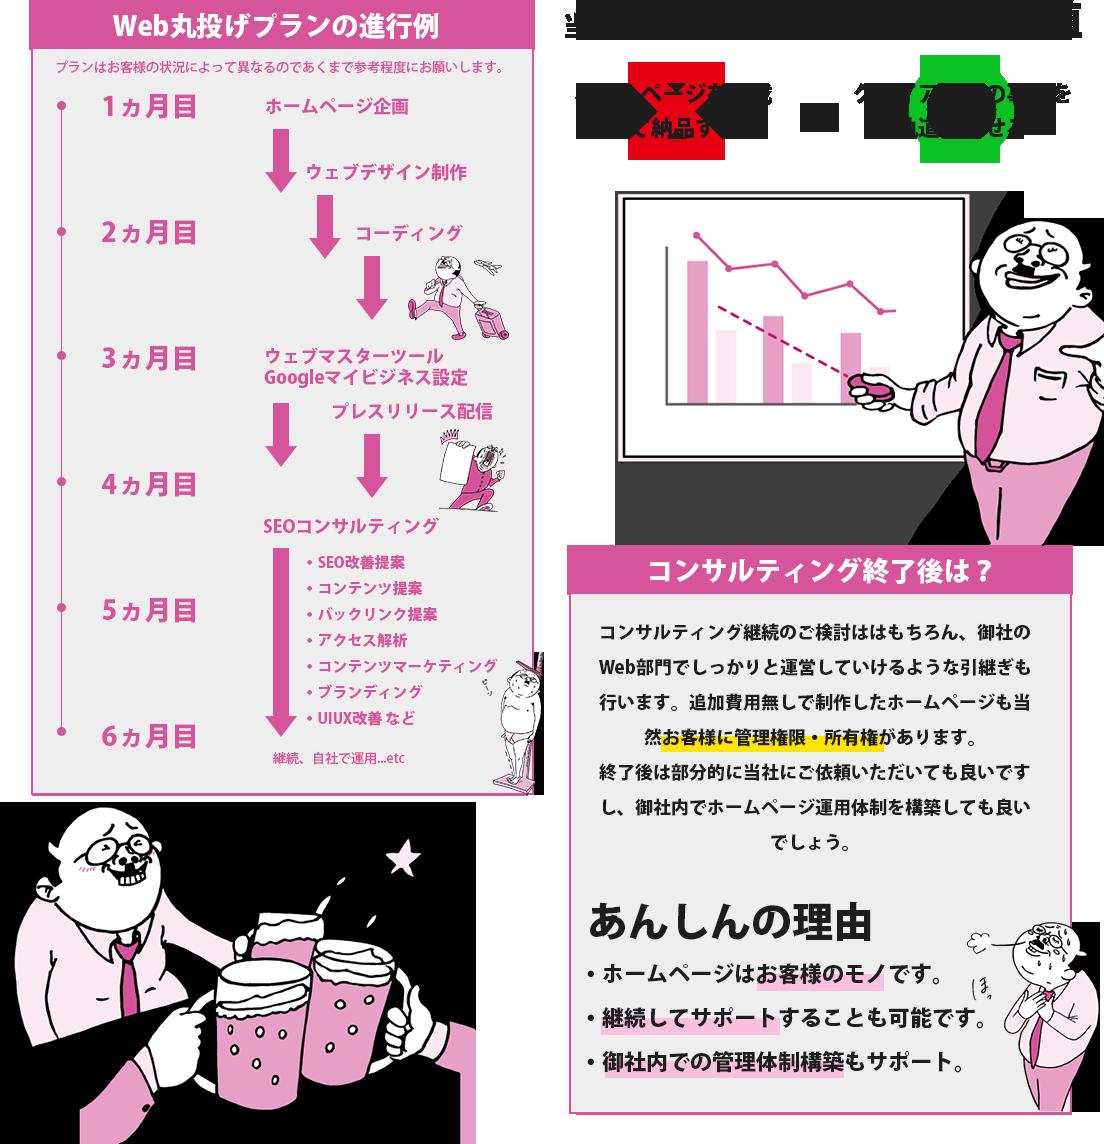 「Web丸投げプラン」の詳細情報